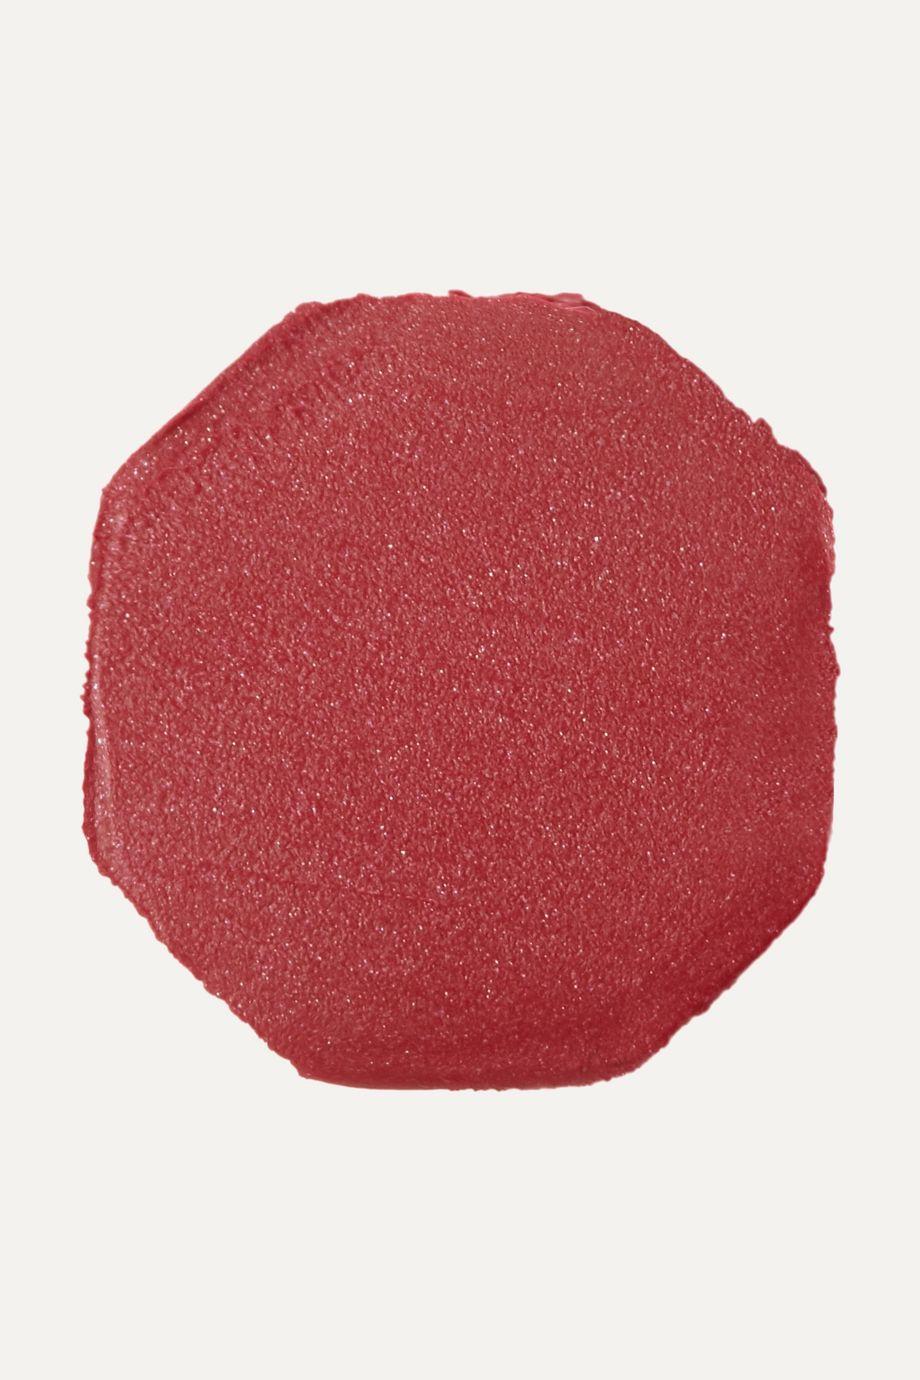 Sisley Le Phyto Rouge Lipstick - 32 Orange Calvi